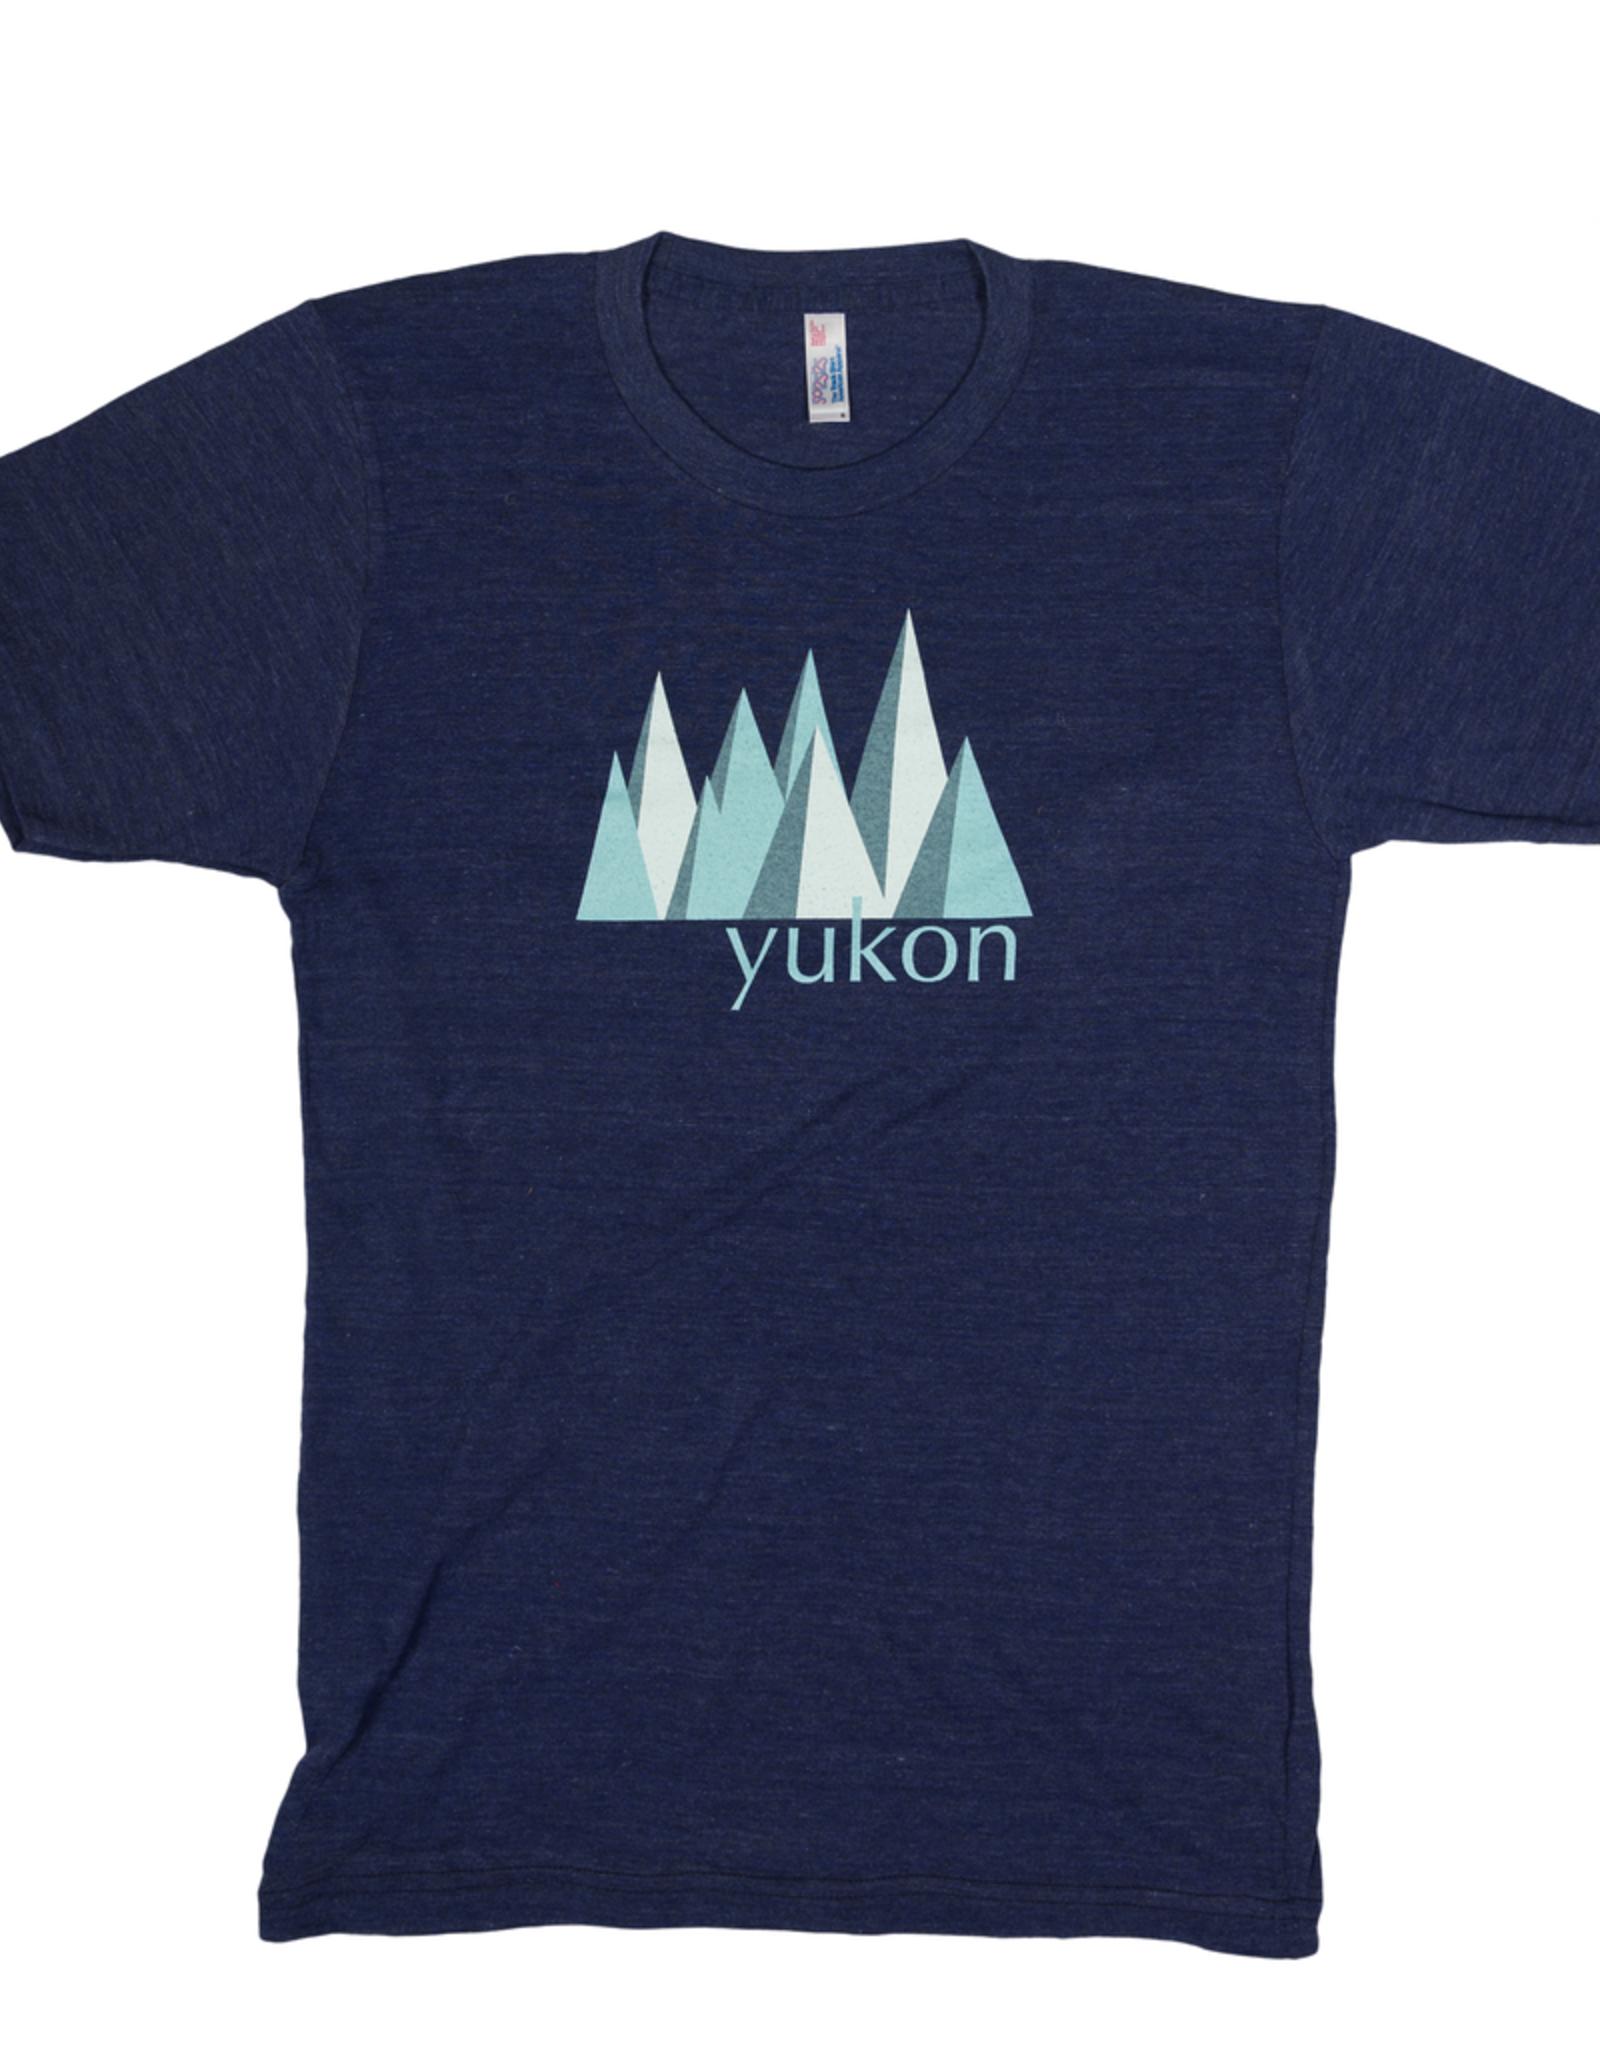 The Collective Good TCG Men's Yukon Blue Mountain Tshirt